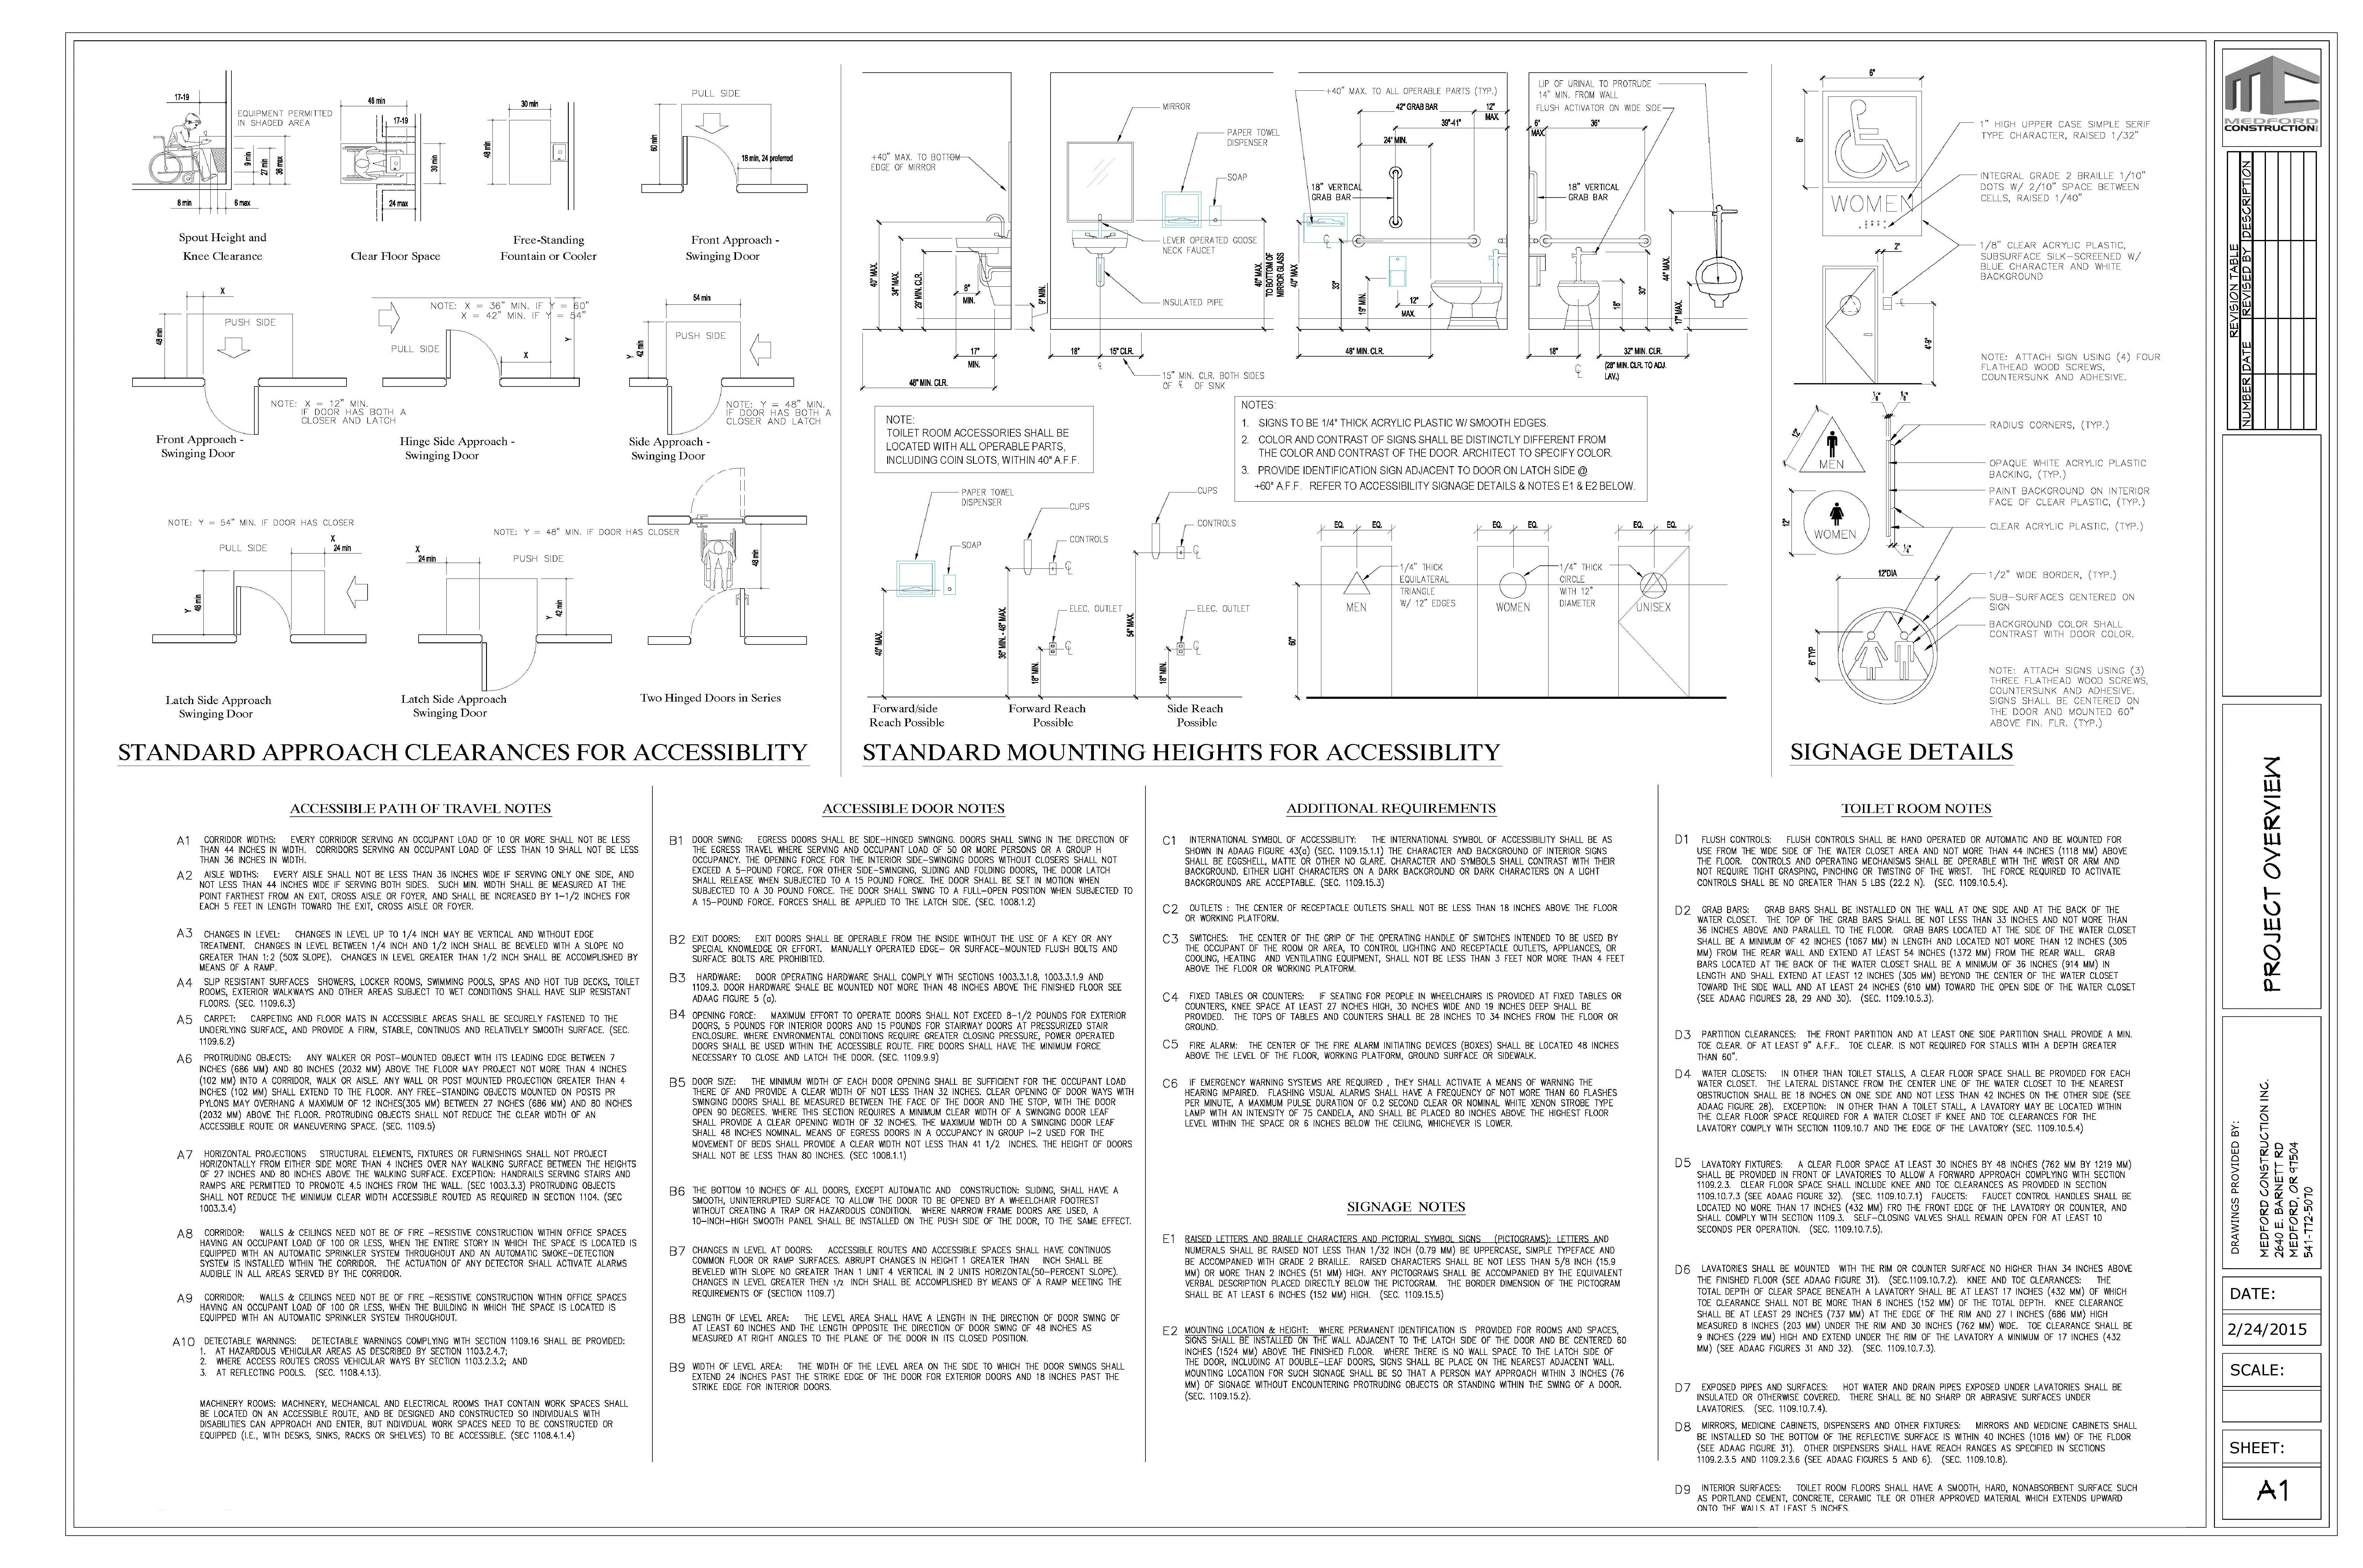 HAJC Remodel-G0.1